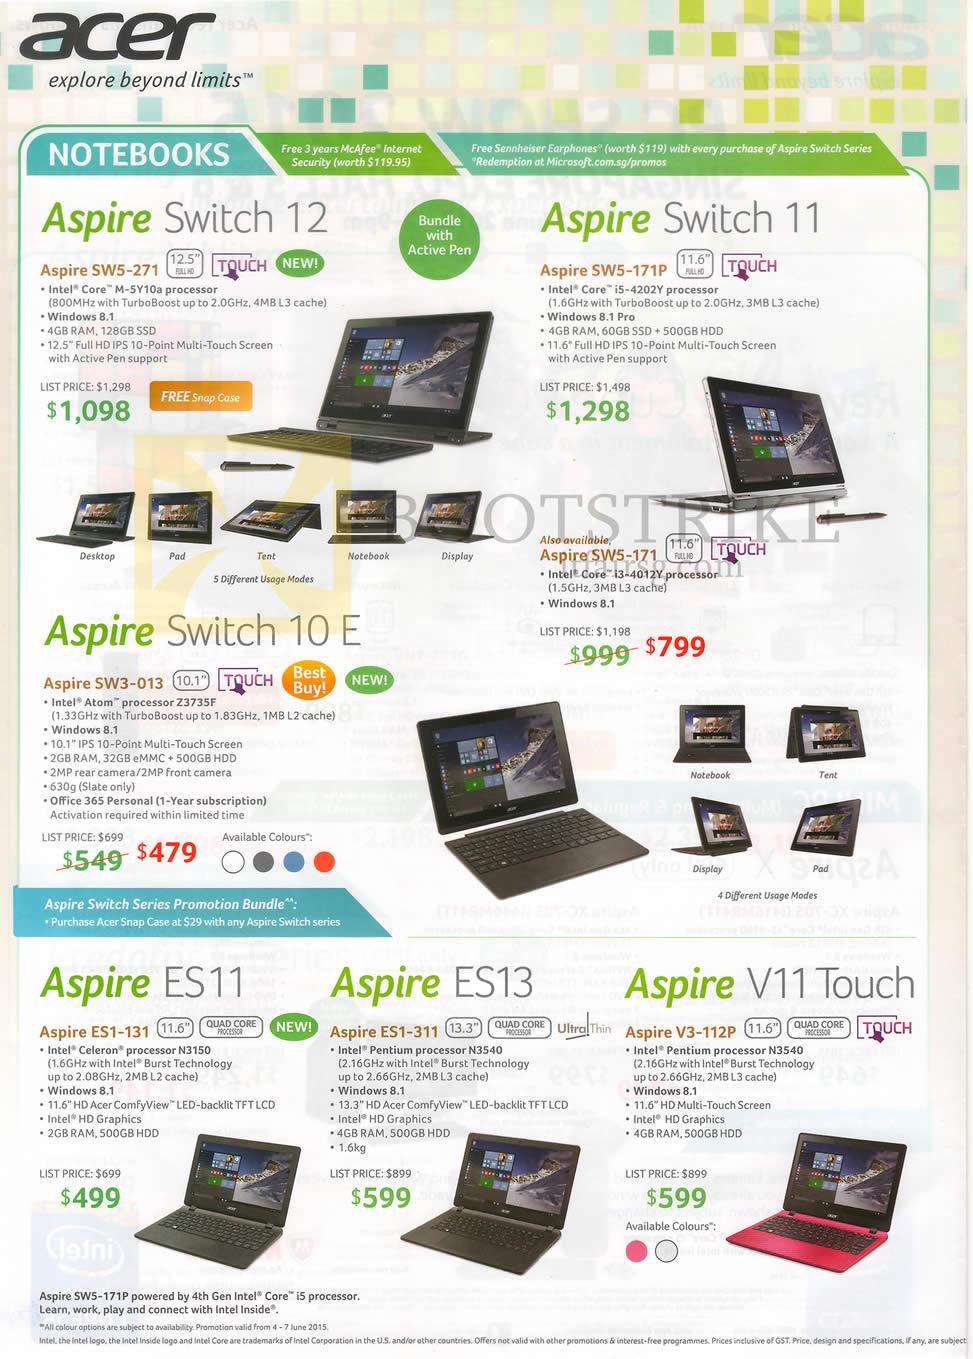 PC SHOW 2015 price list image brochure of Acer Notebooks Aspire Switch 10E, 11, 12, ES11, ES13, V11 Touch, Aspire SW5-271, 171P, 171, SW3-013, ES1-131, 311, V3-112P